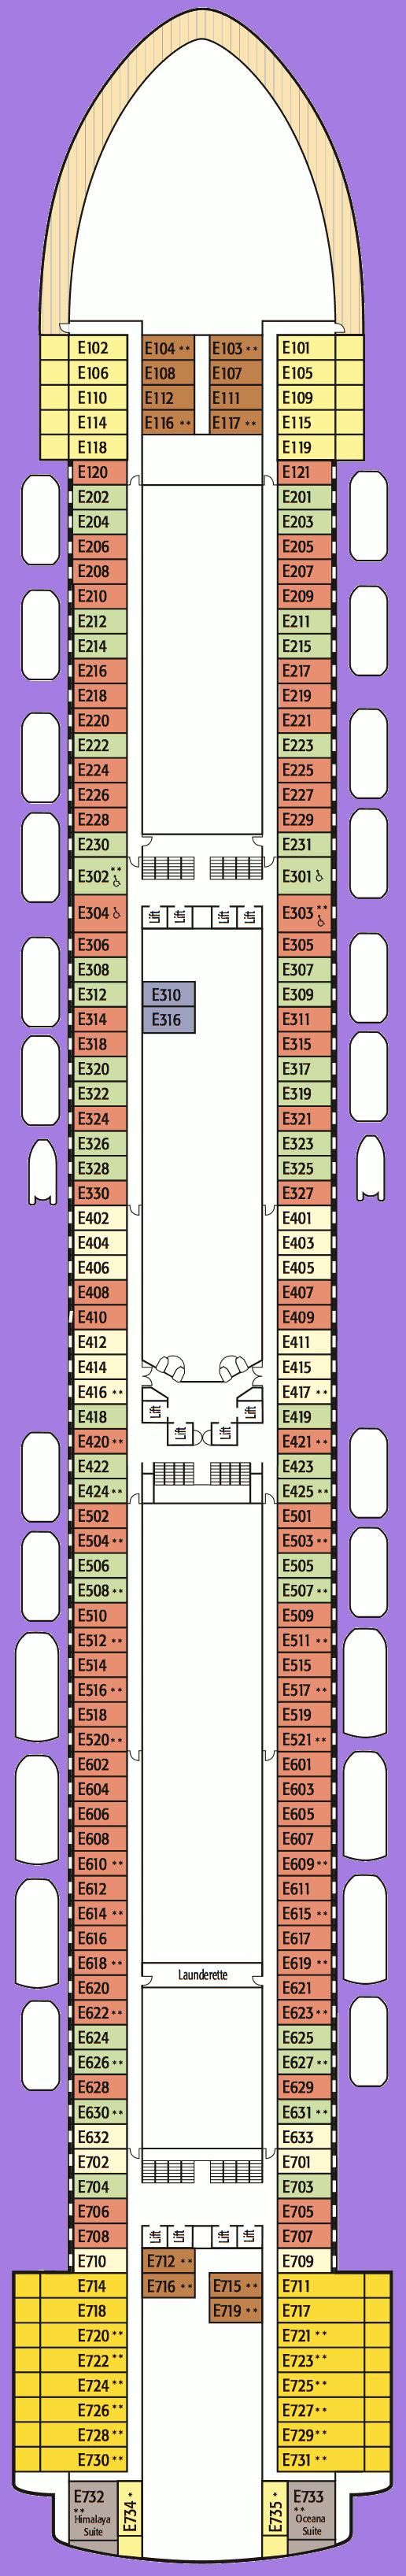 Azura Deck 8